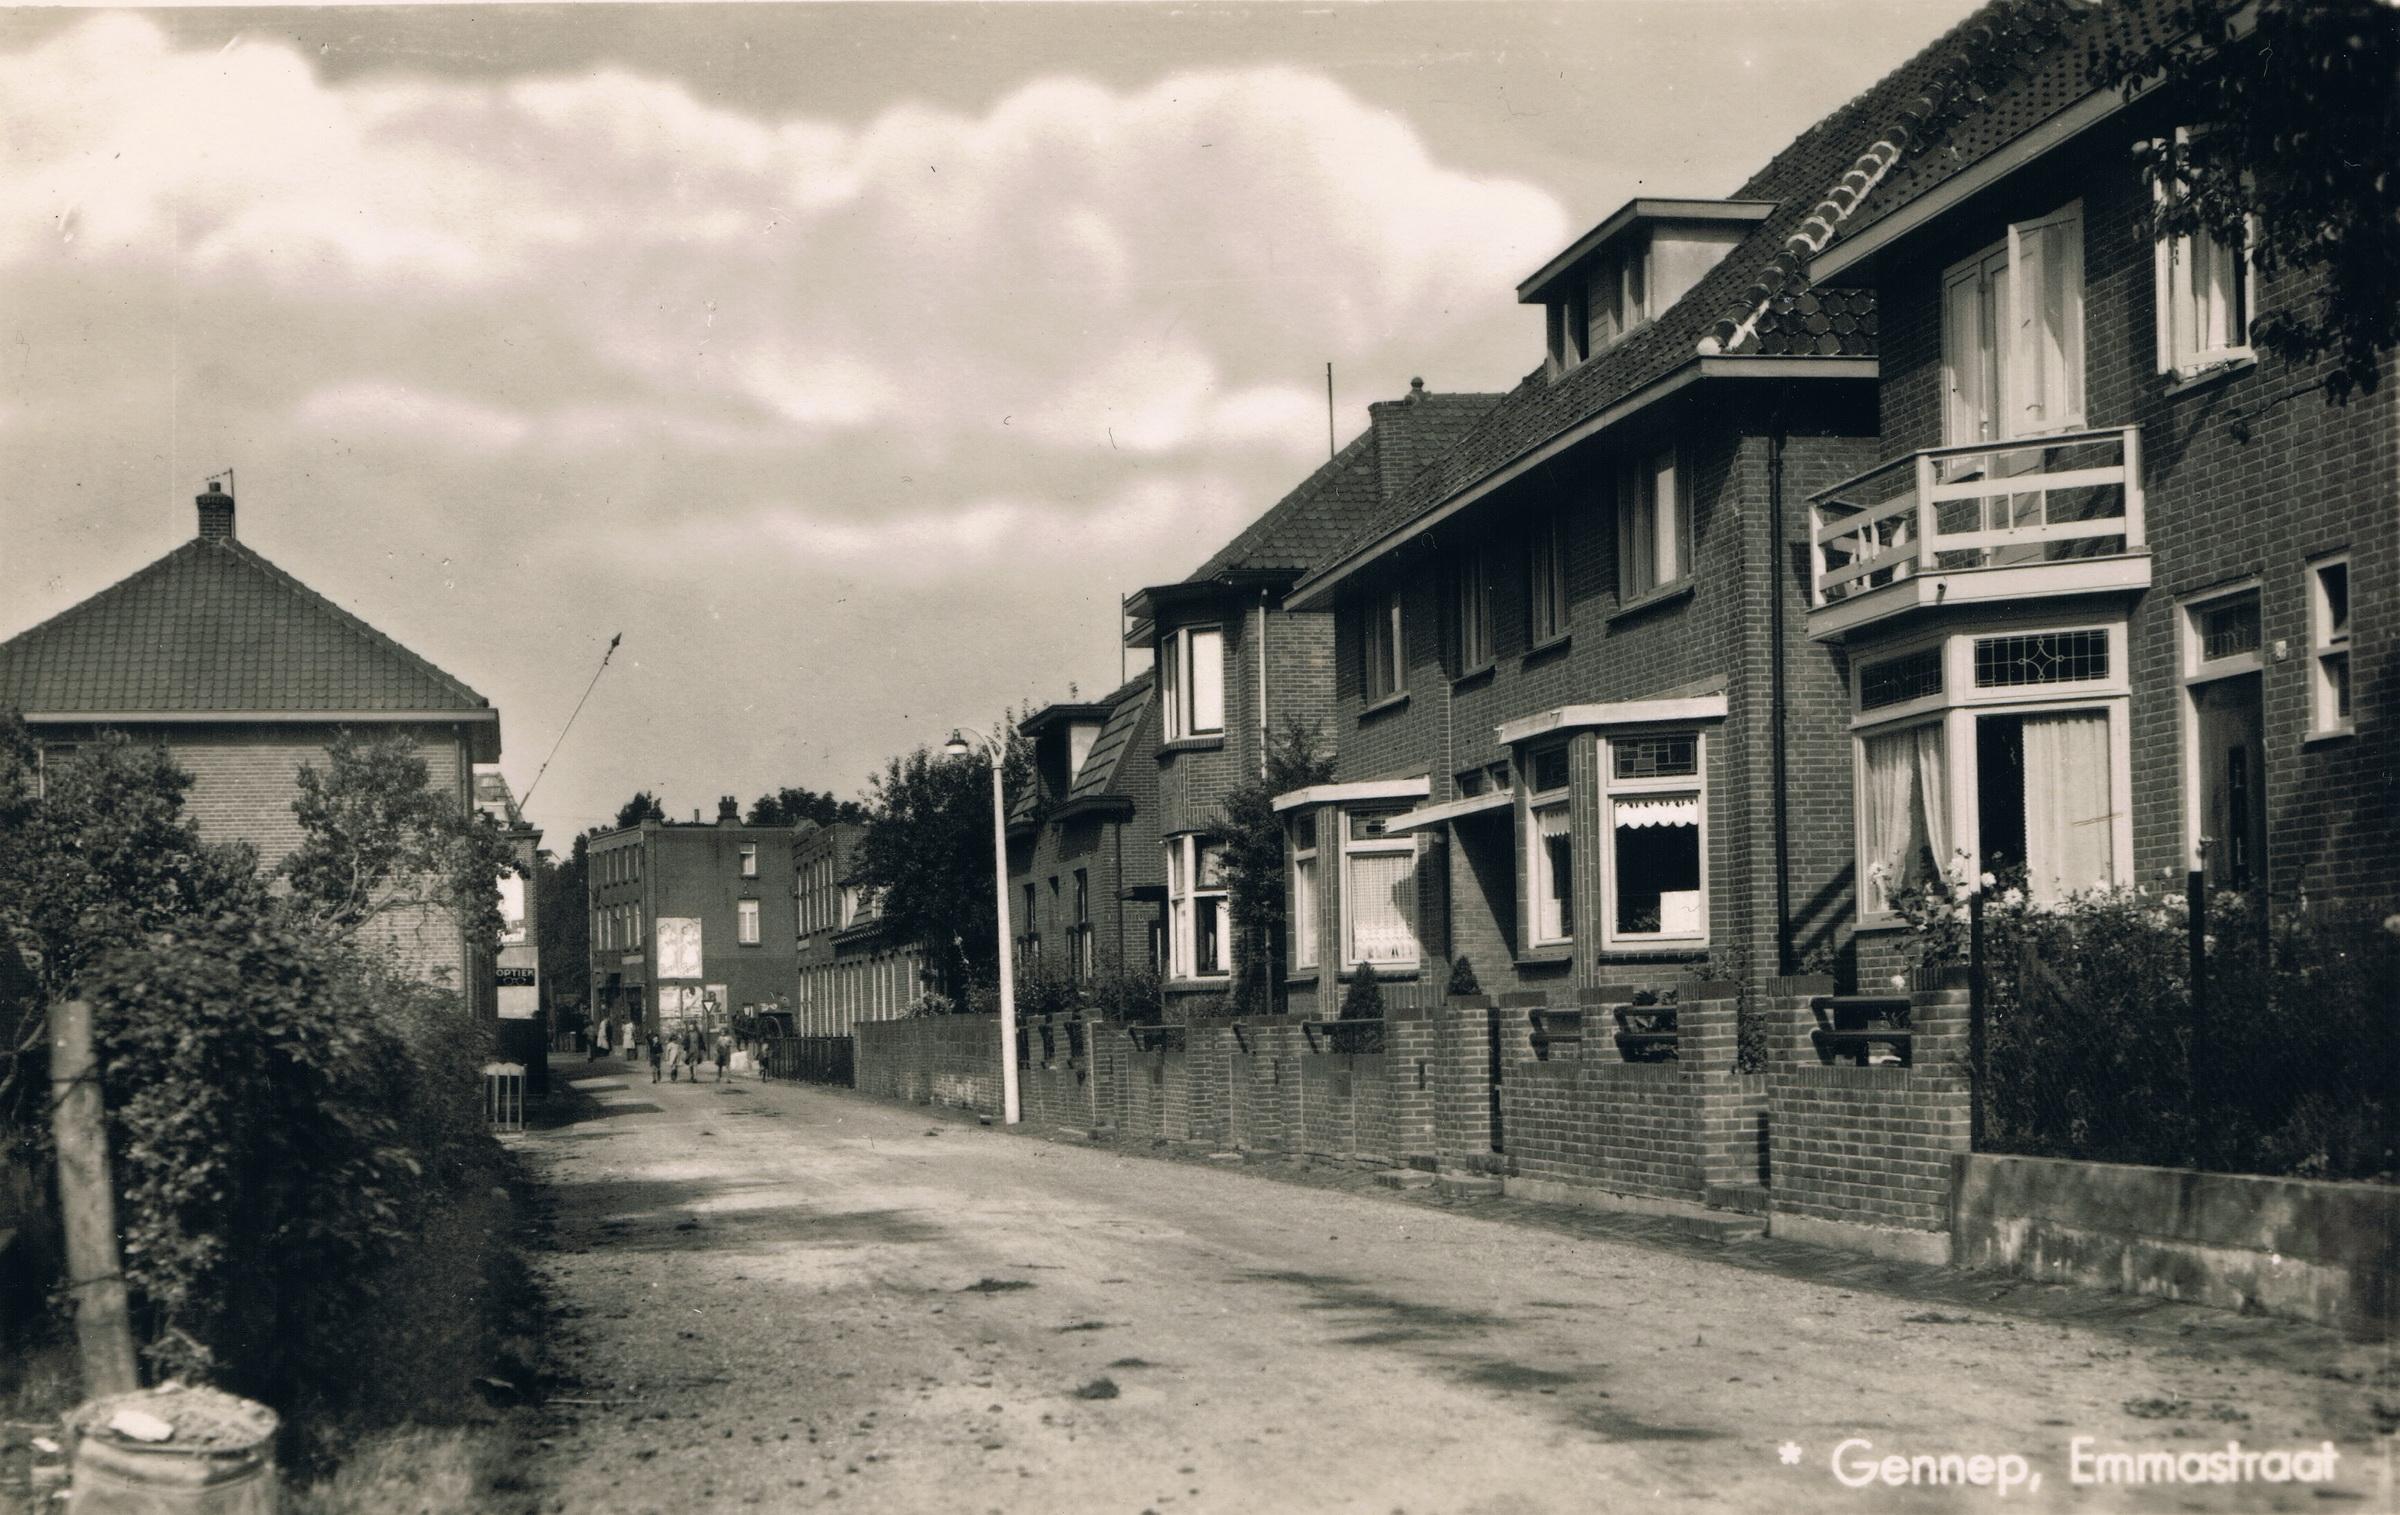 1936-Emmastraat-01